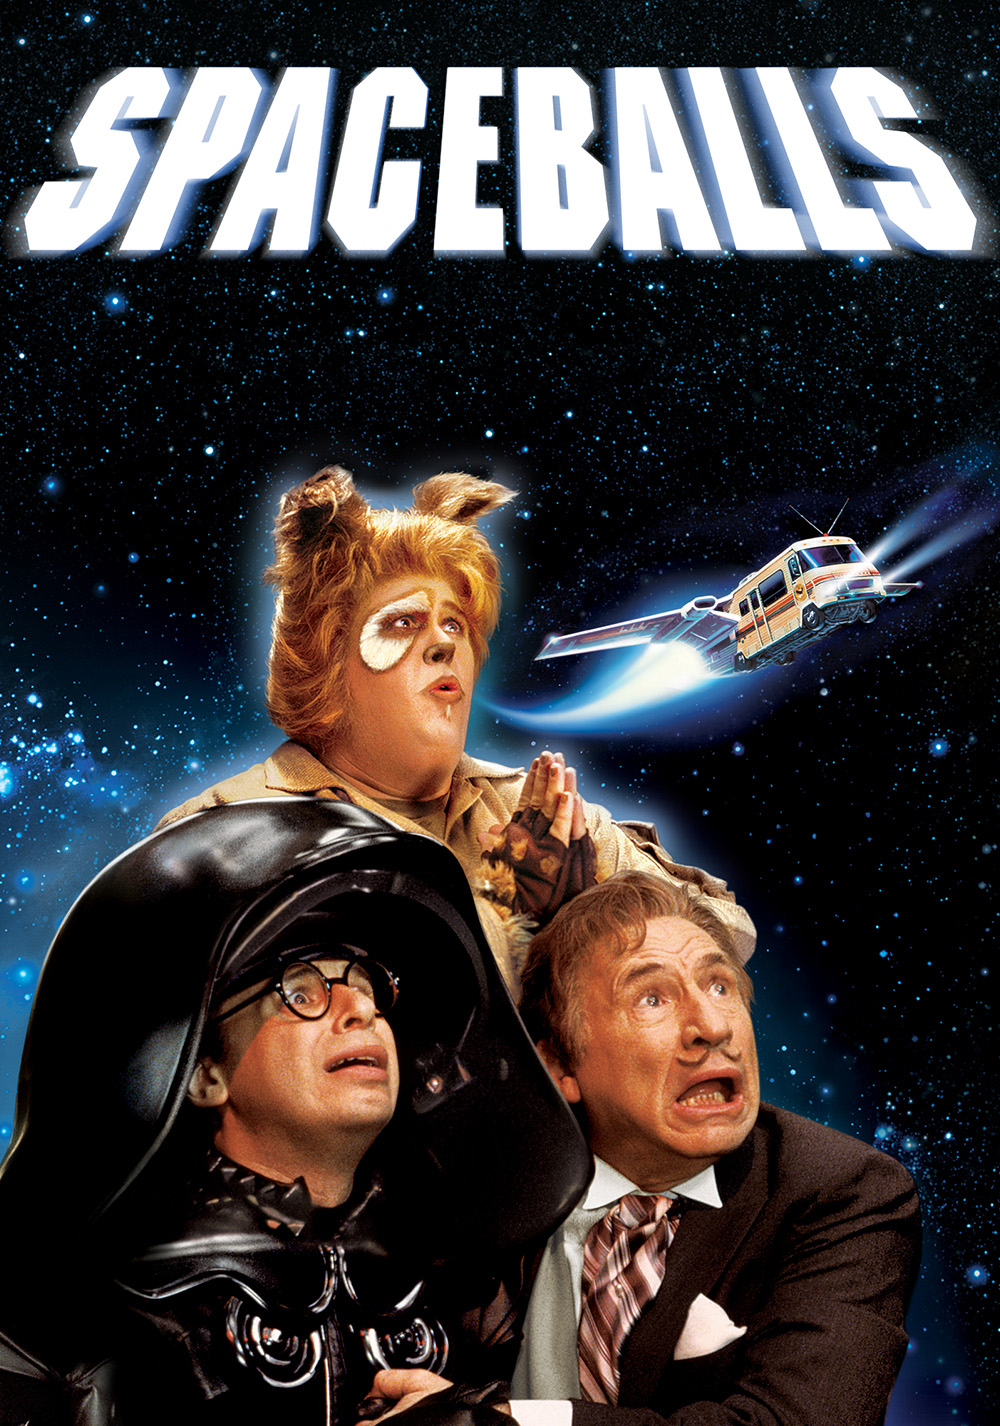 Spaceballs | Movie fanart | fanart.tv